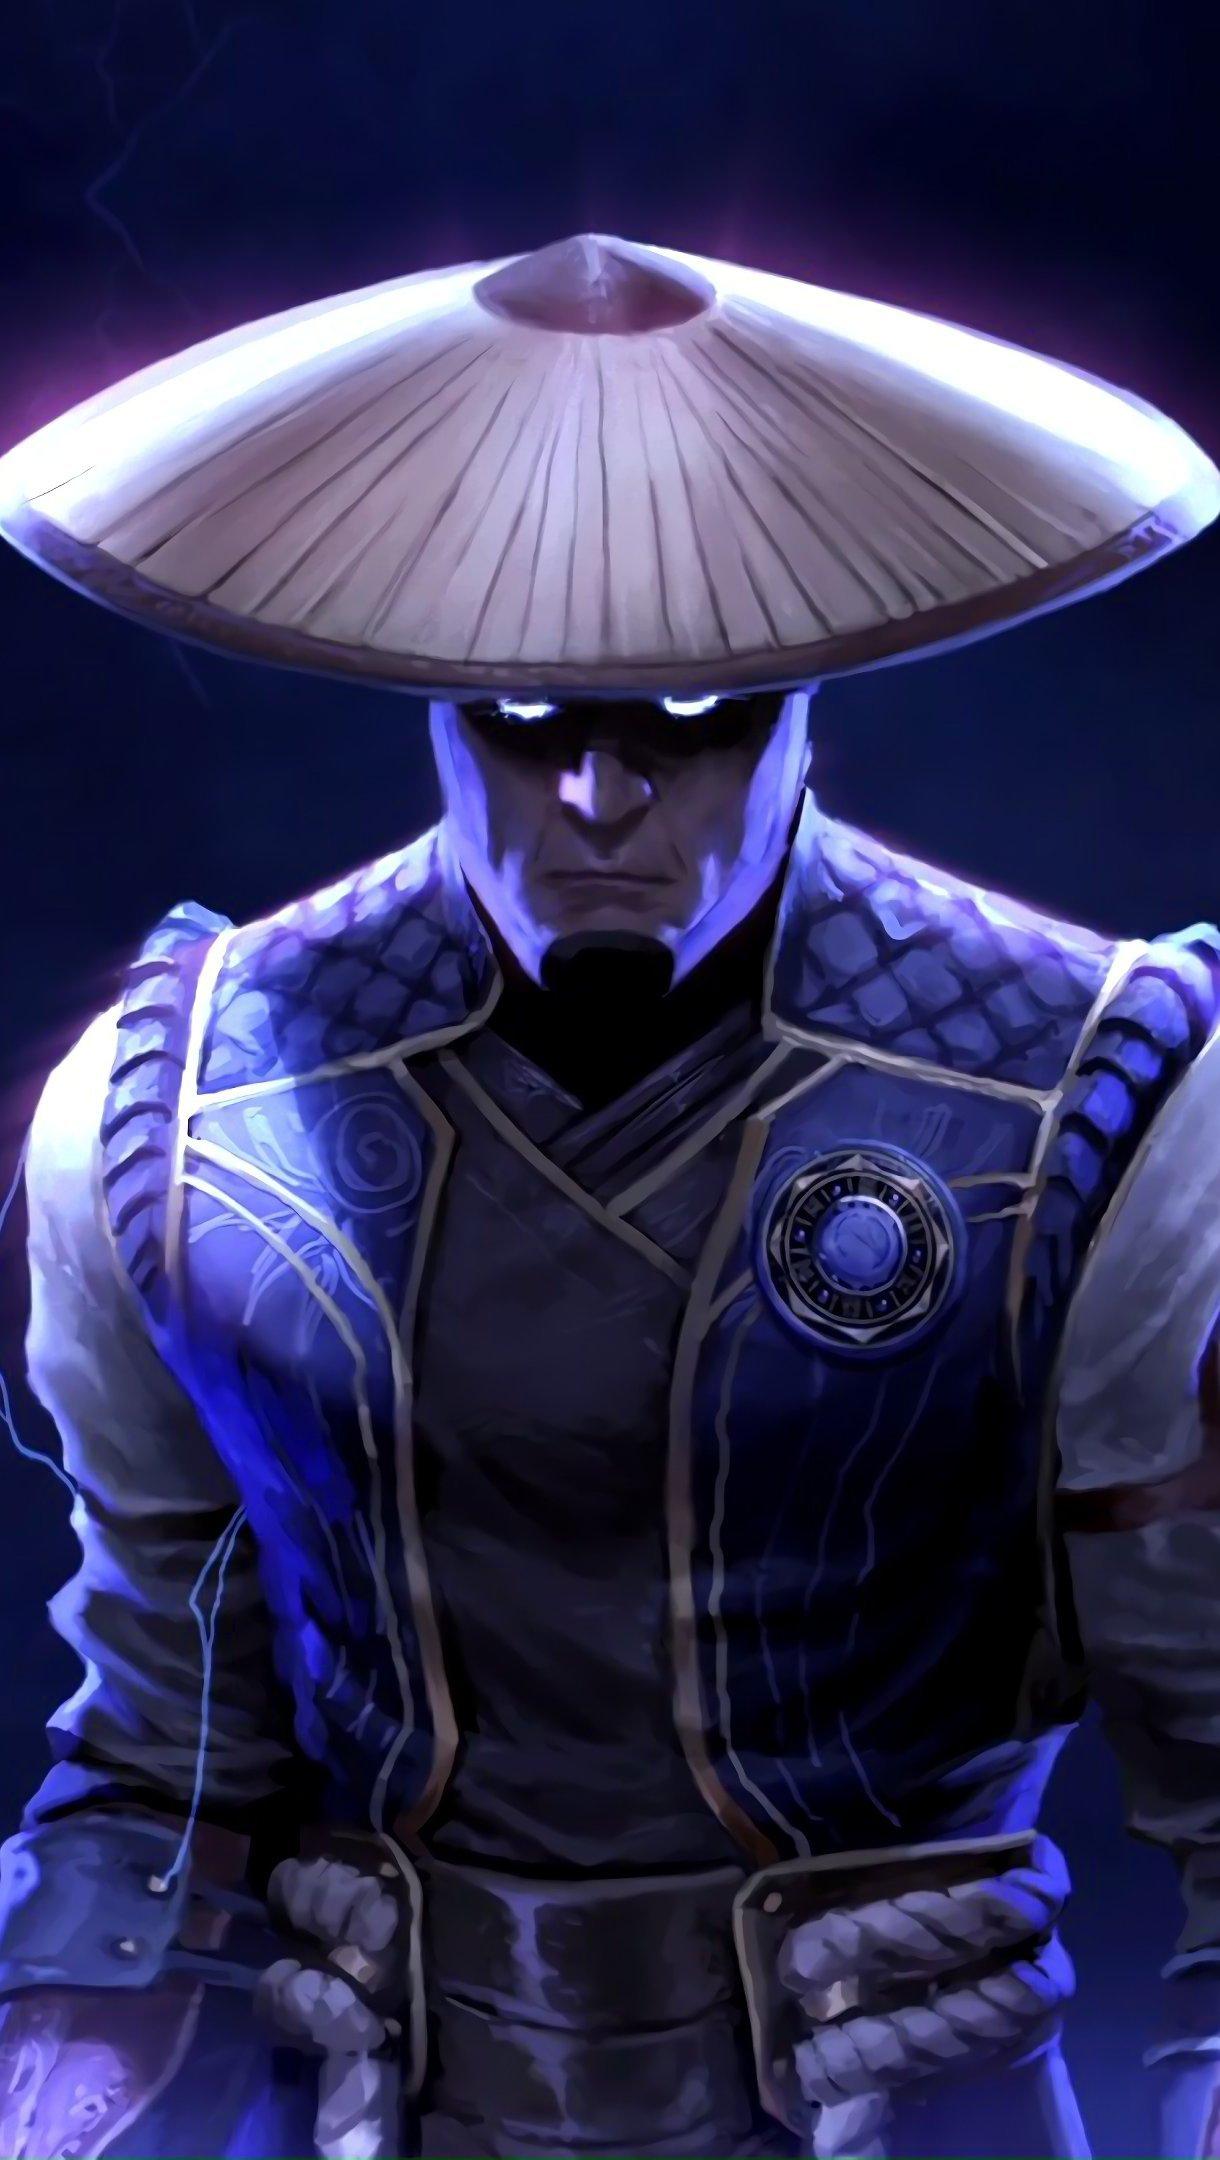 Fondos de pantalla Raiden de Mortal Kombat Vertical